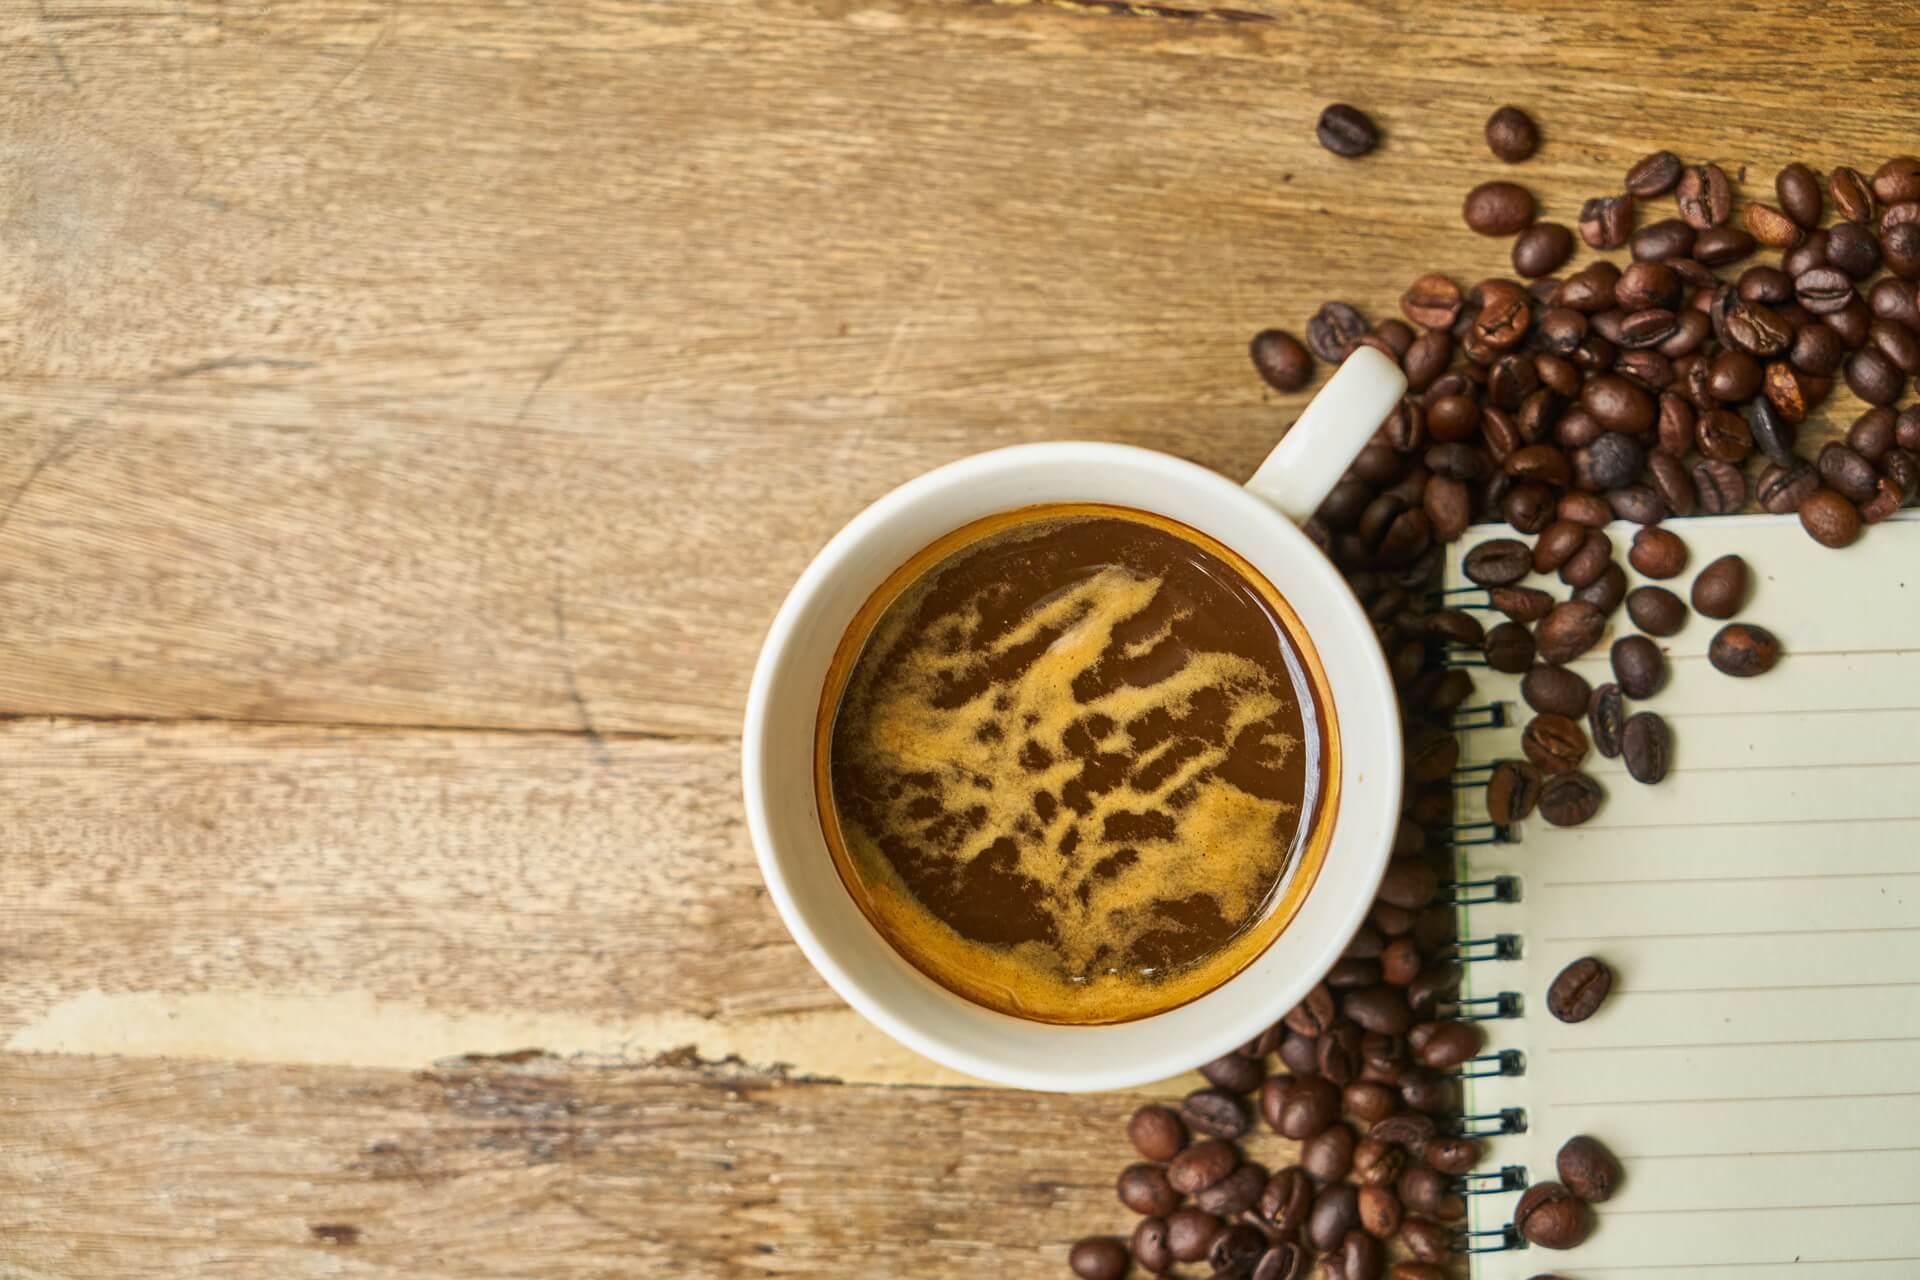 kaffee säuregehalt header